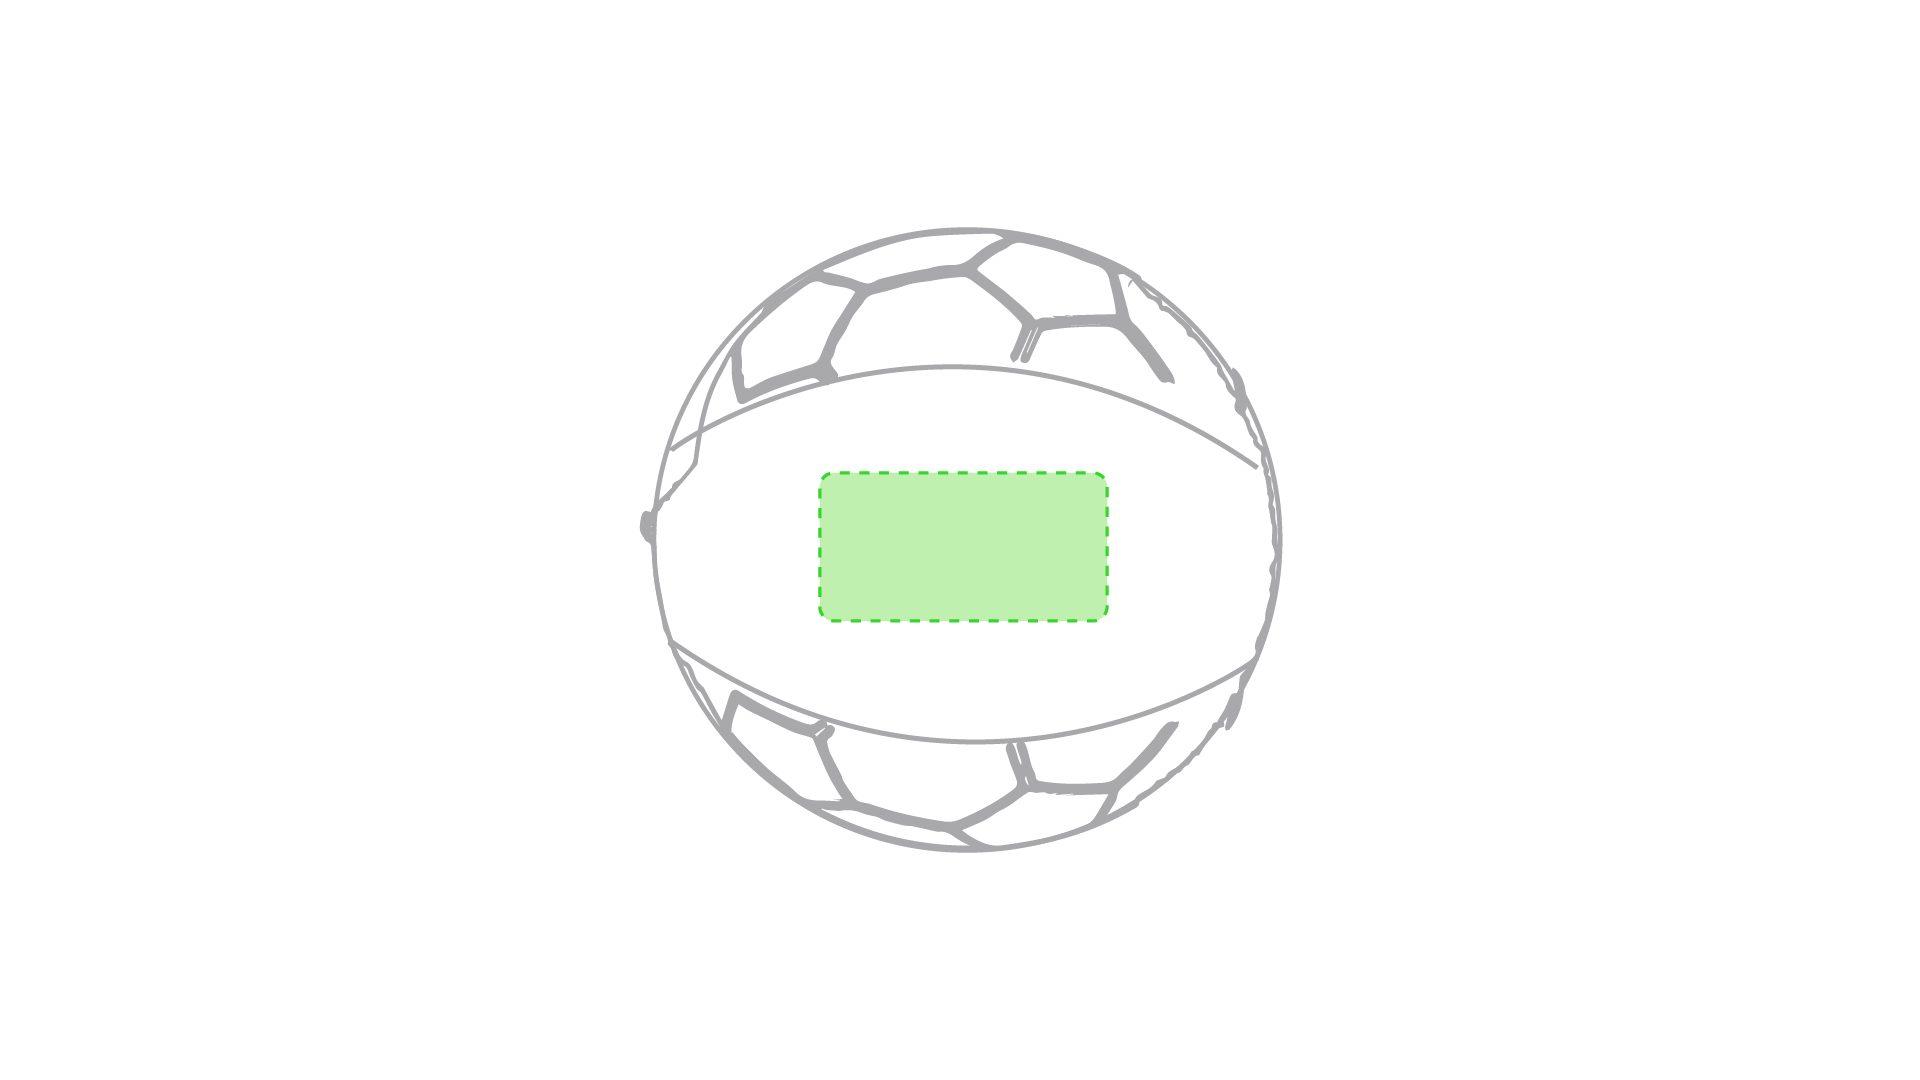 Pelota de fútbol hinchable 1